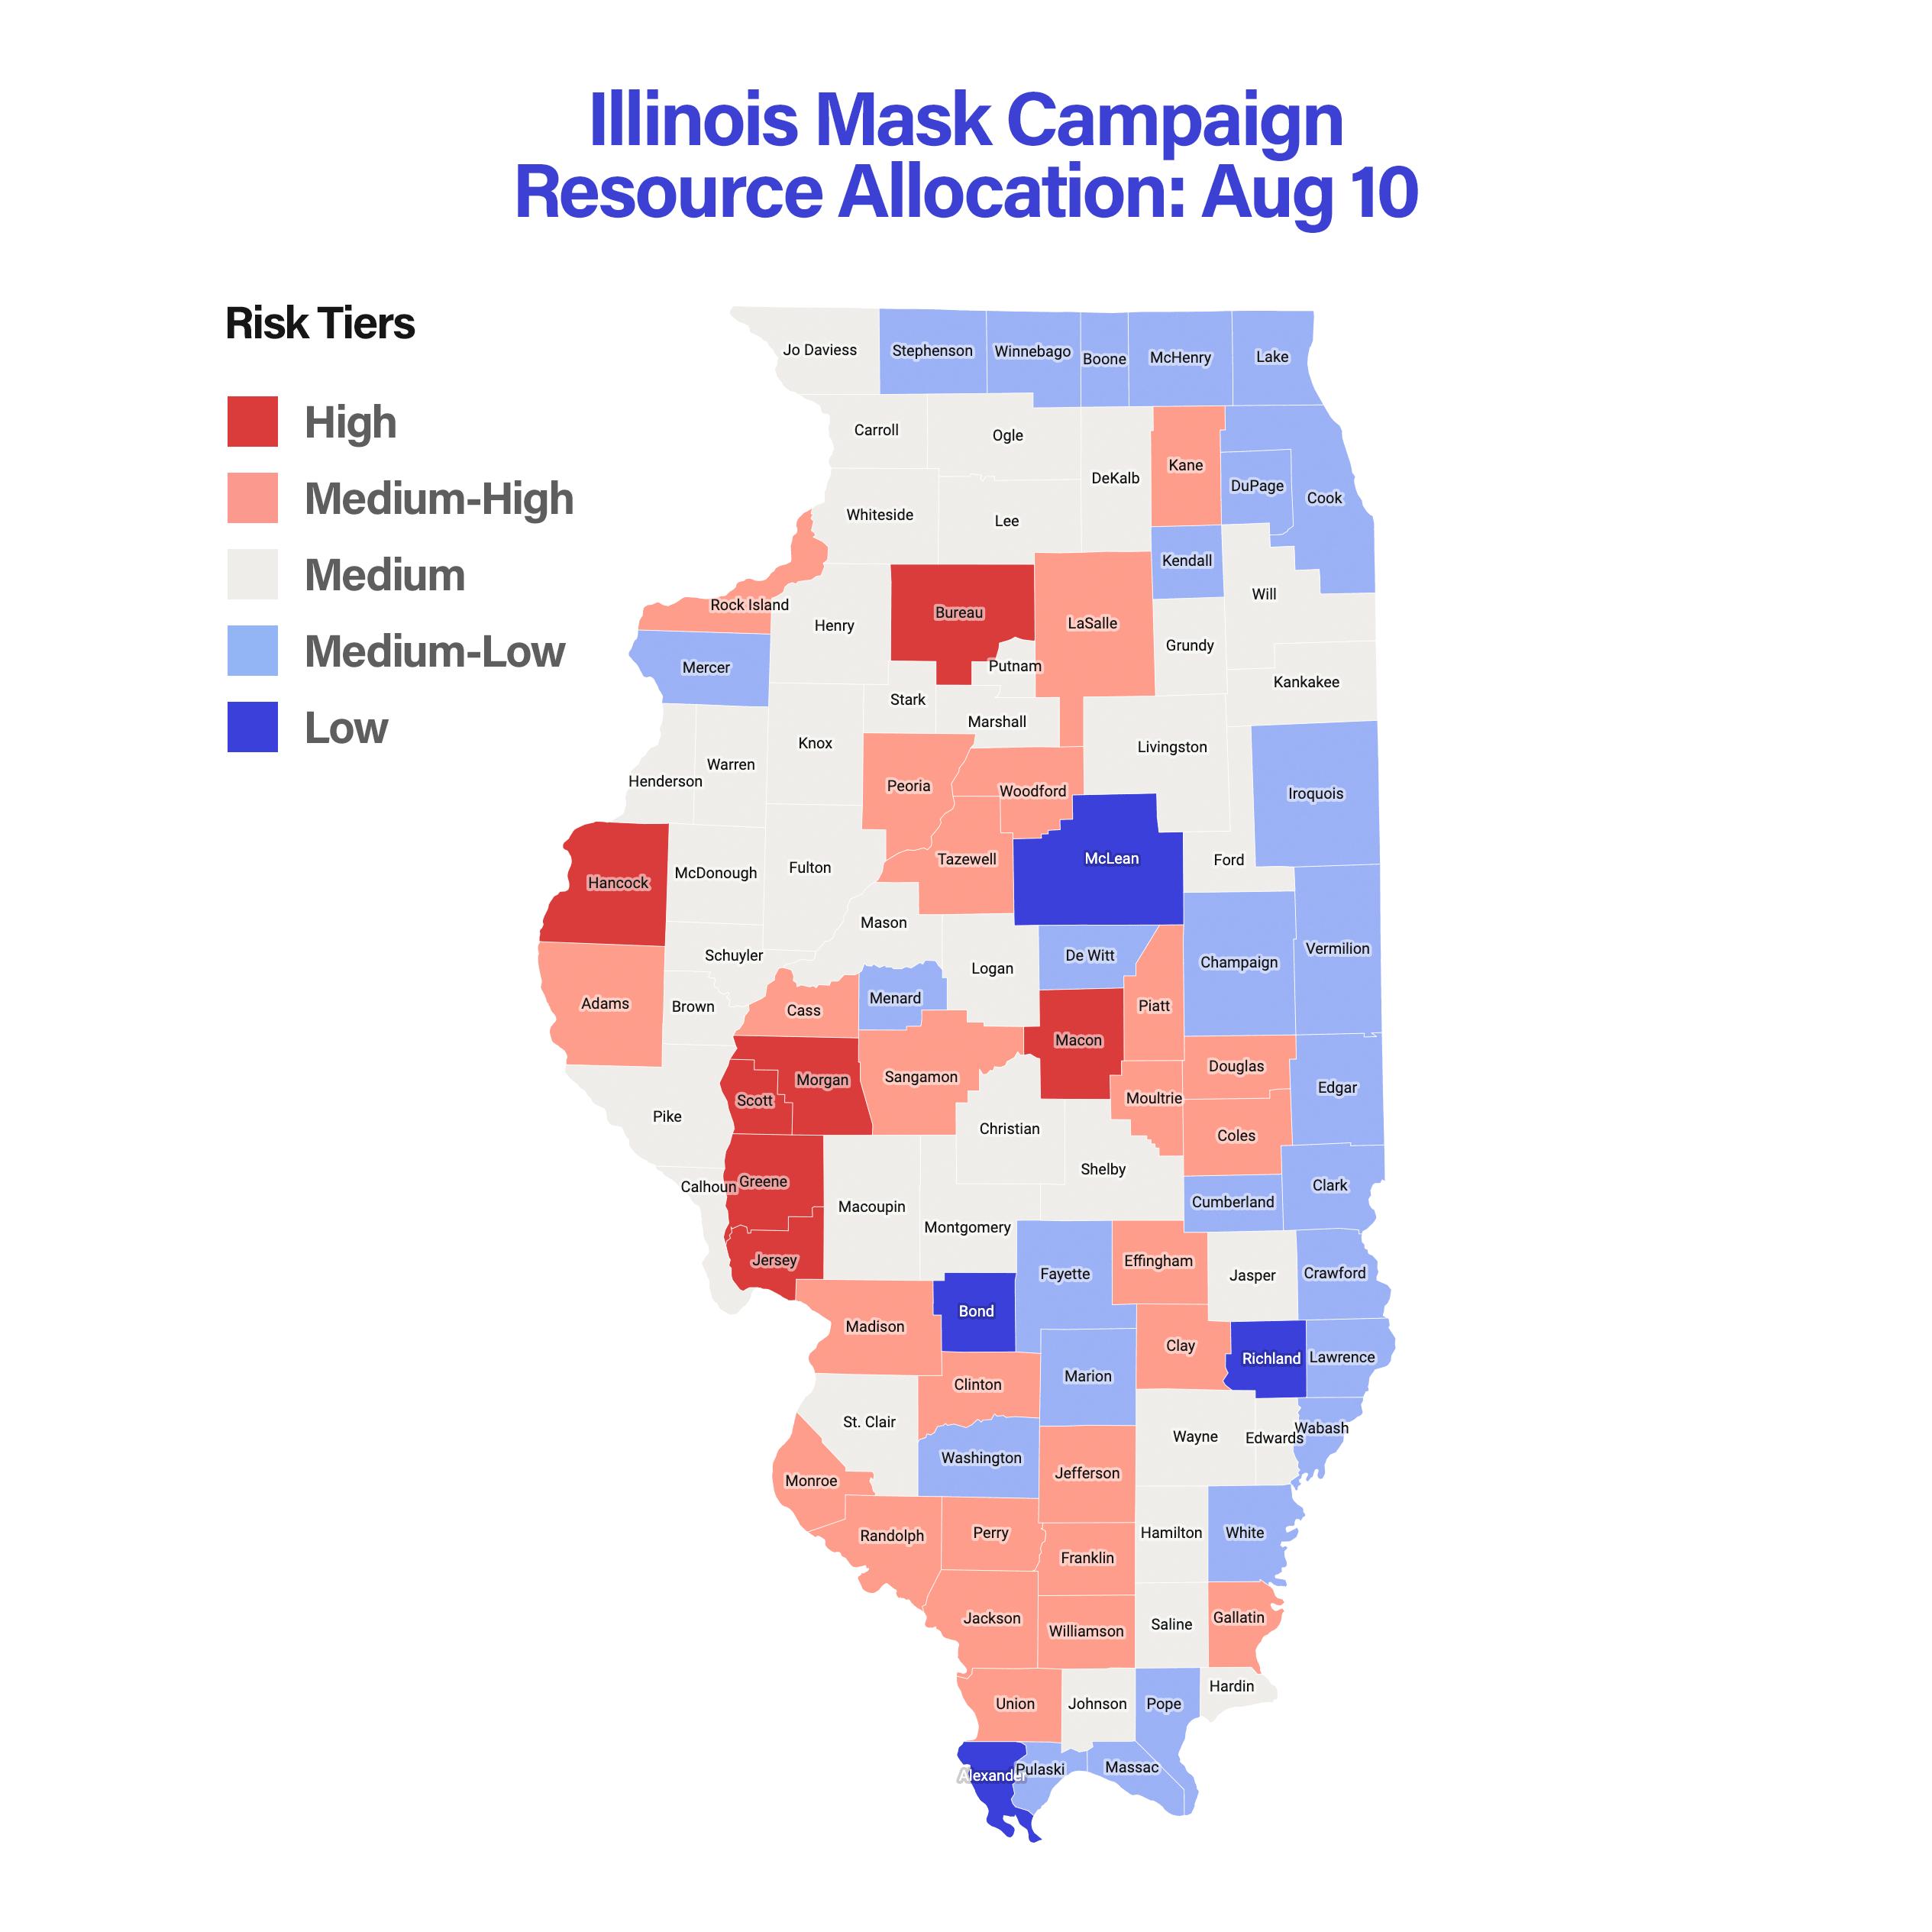 Illinois Mask Campaign Resource Allocation: Aug 10